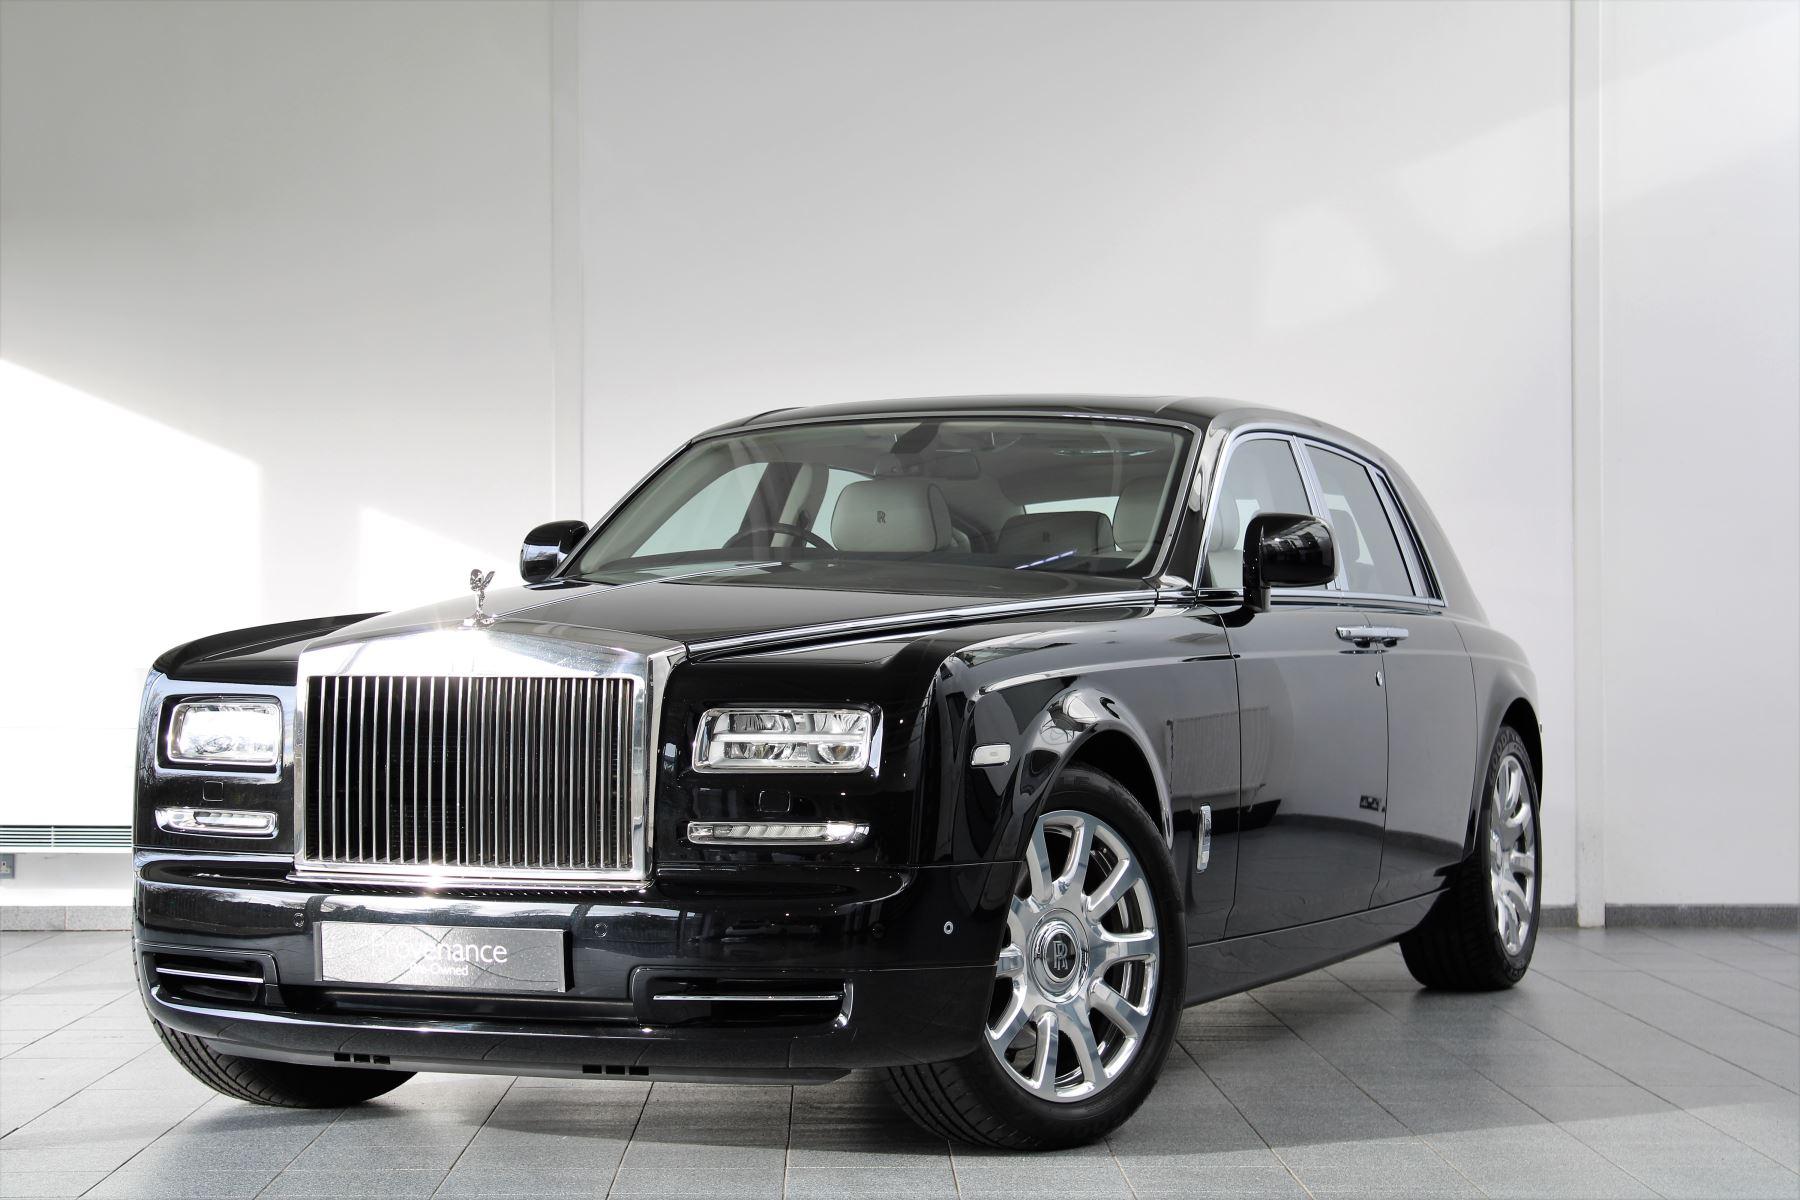 Rolls-Royce Phantom II 4dr Auto image 3